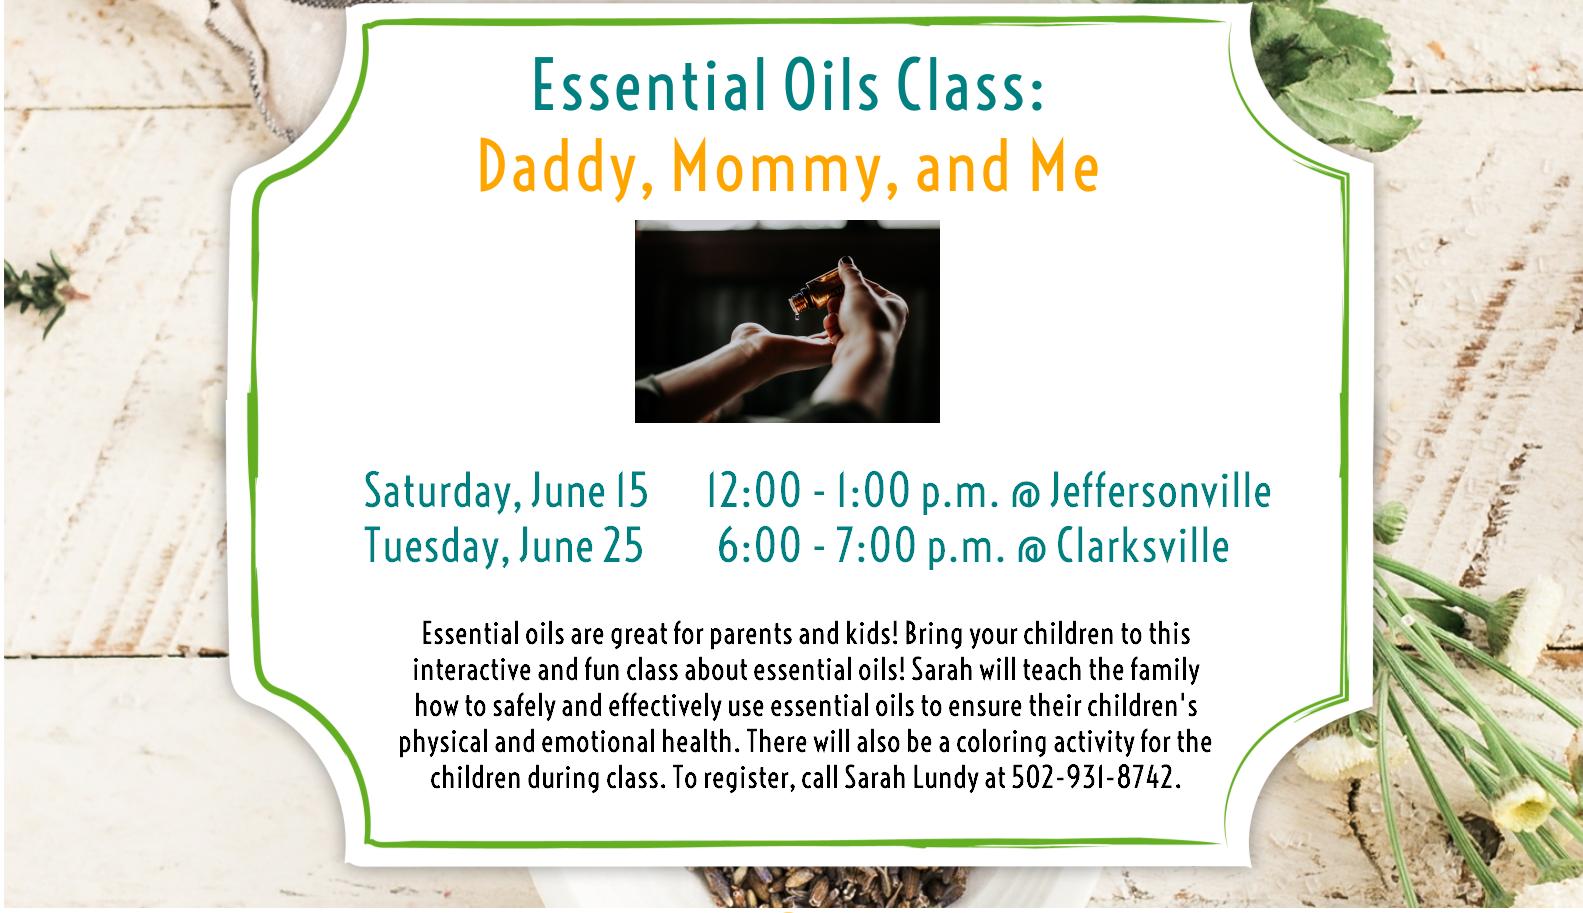 Flyer for monthly Essential Oils program